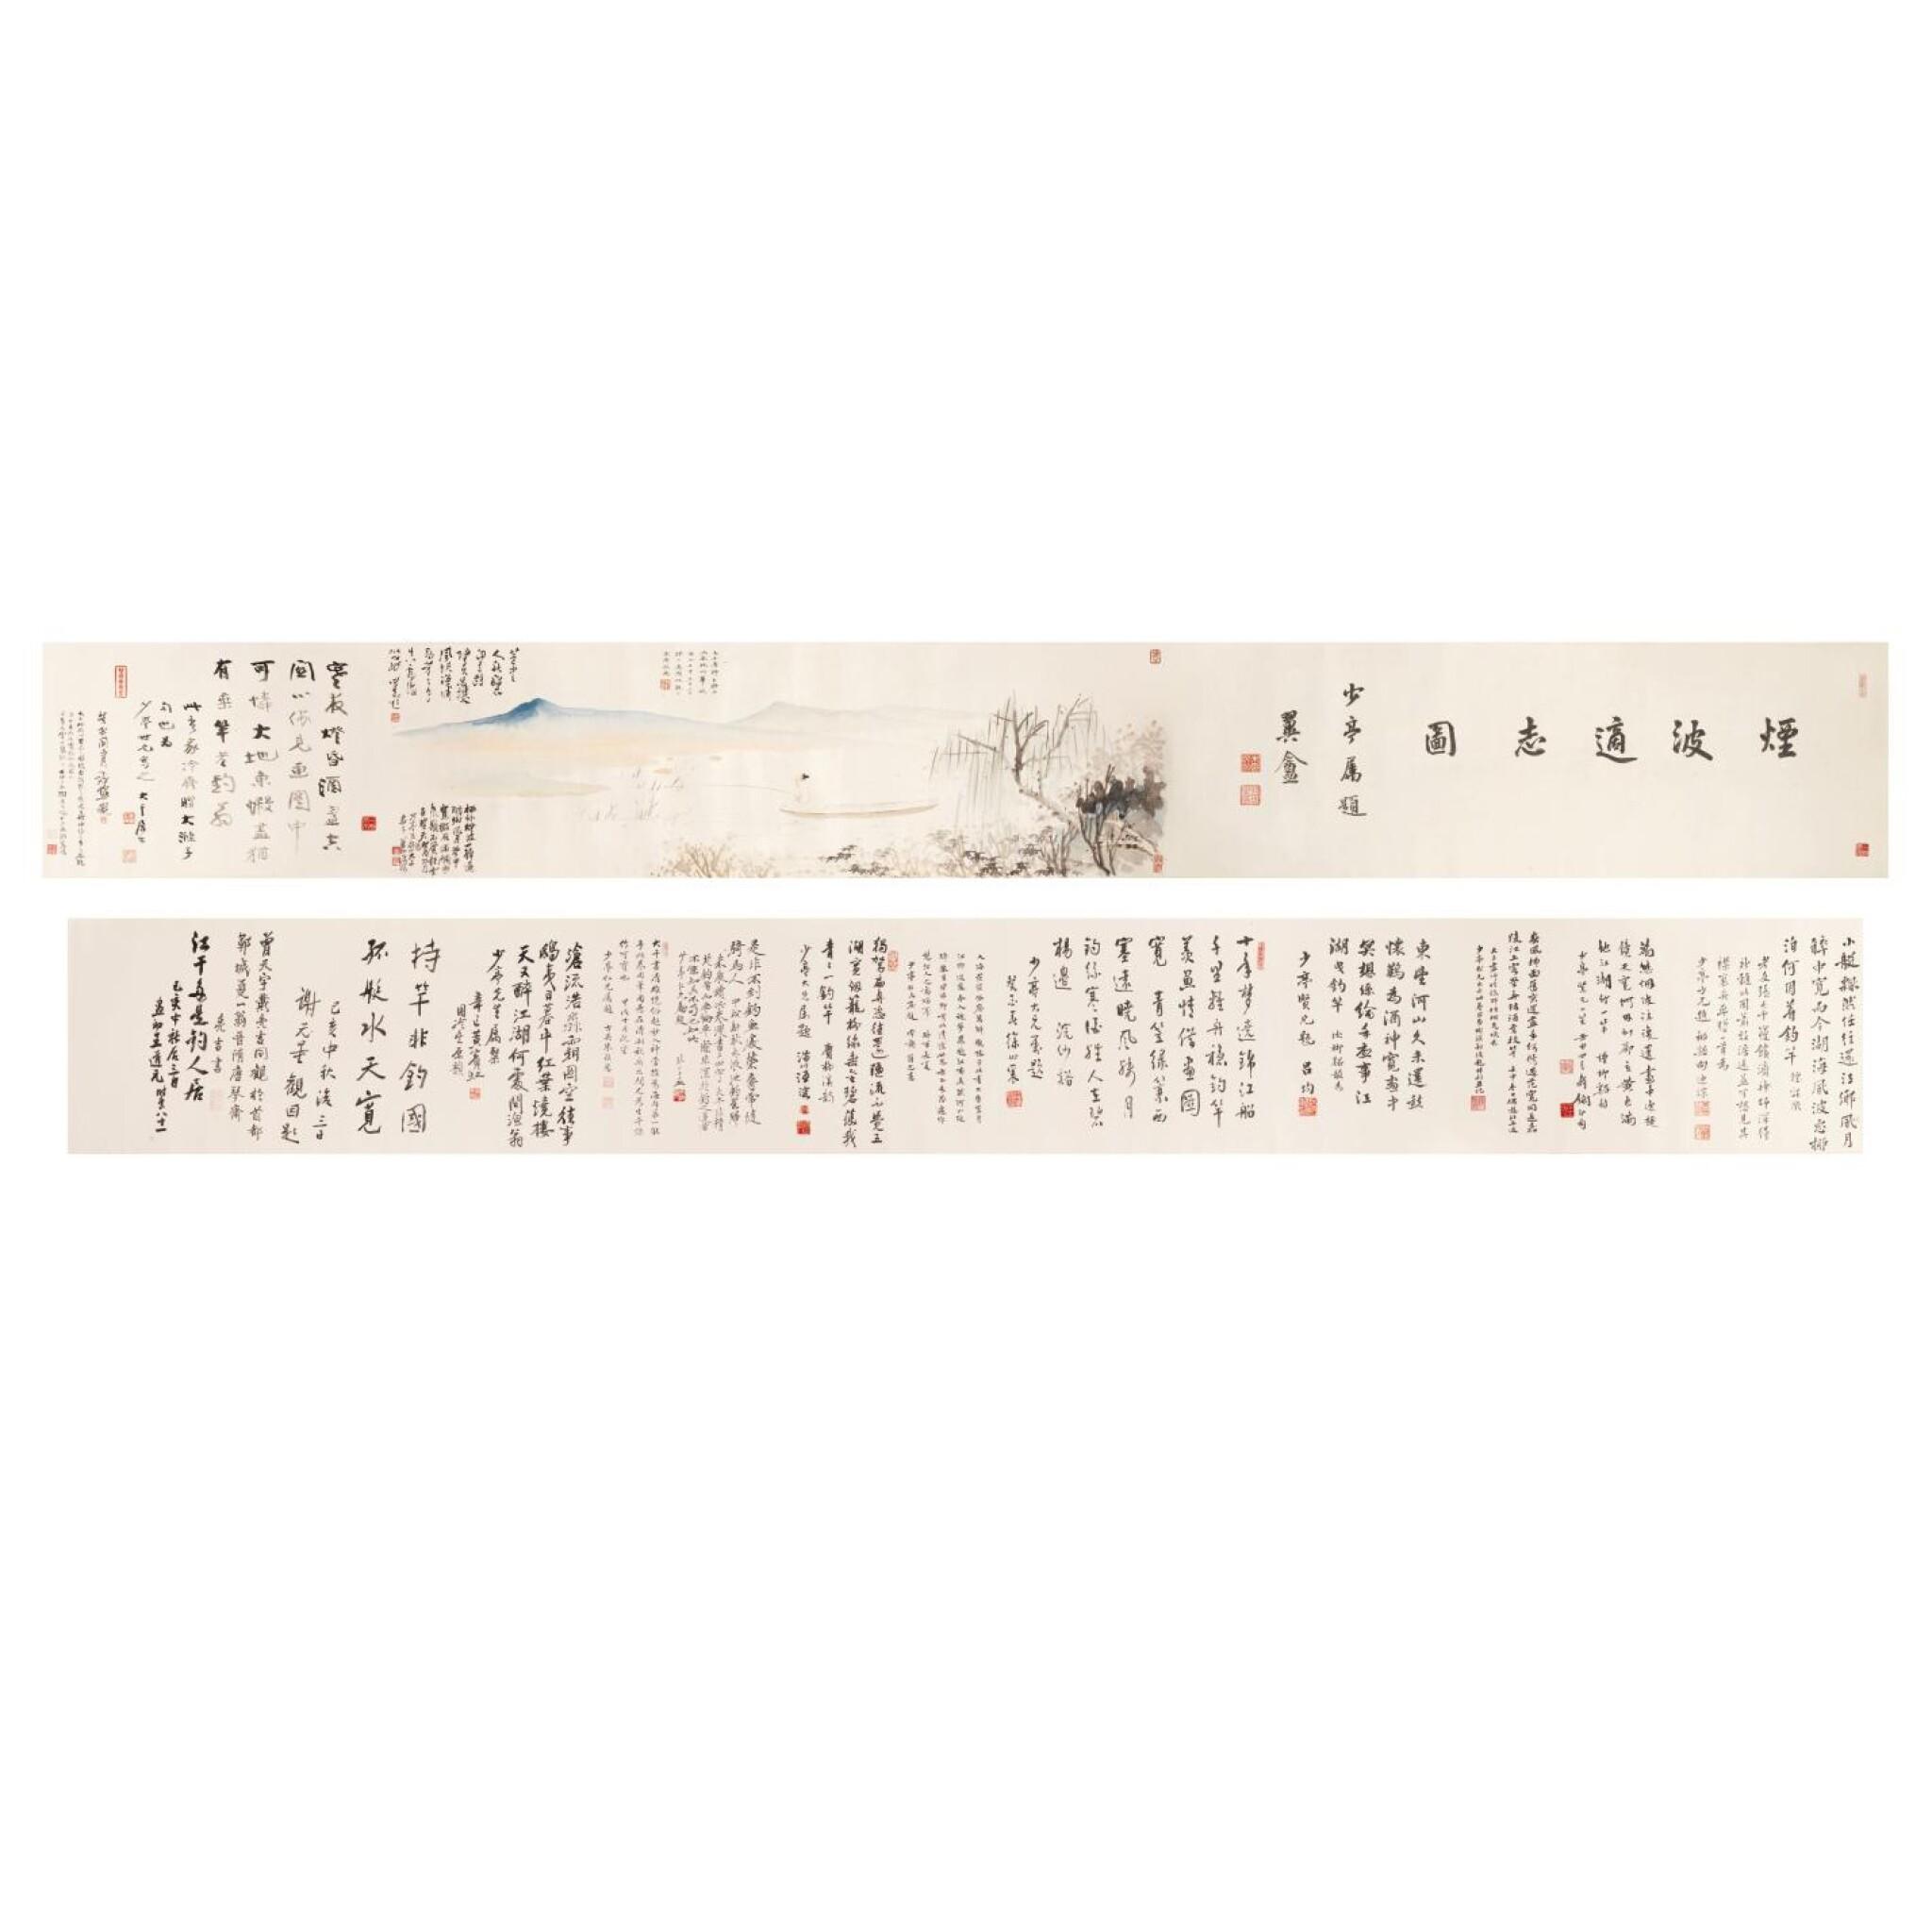 View full screen - View 1 of Lot 136. ZHANG DAQIAN (1899-1983)    MISTY RIVER LANDSCAPE   張大千 (1899-1983年)及諸名家題跋   《煙波適志圖》 設色紙本 手卷.